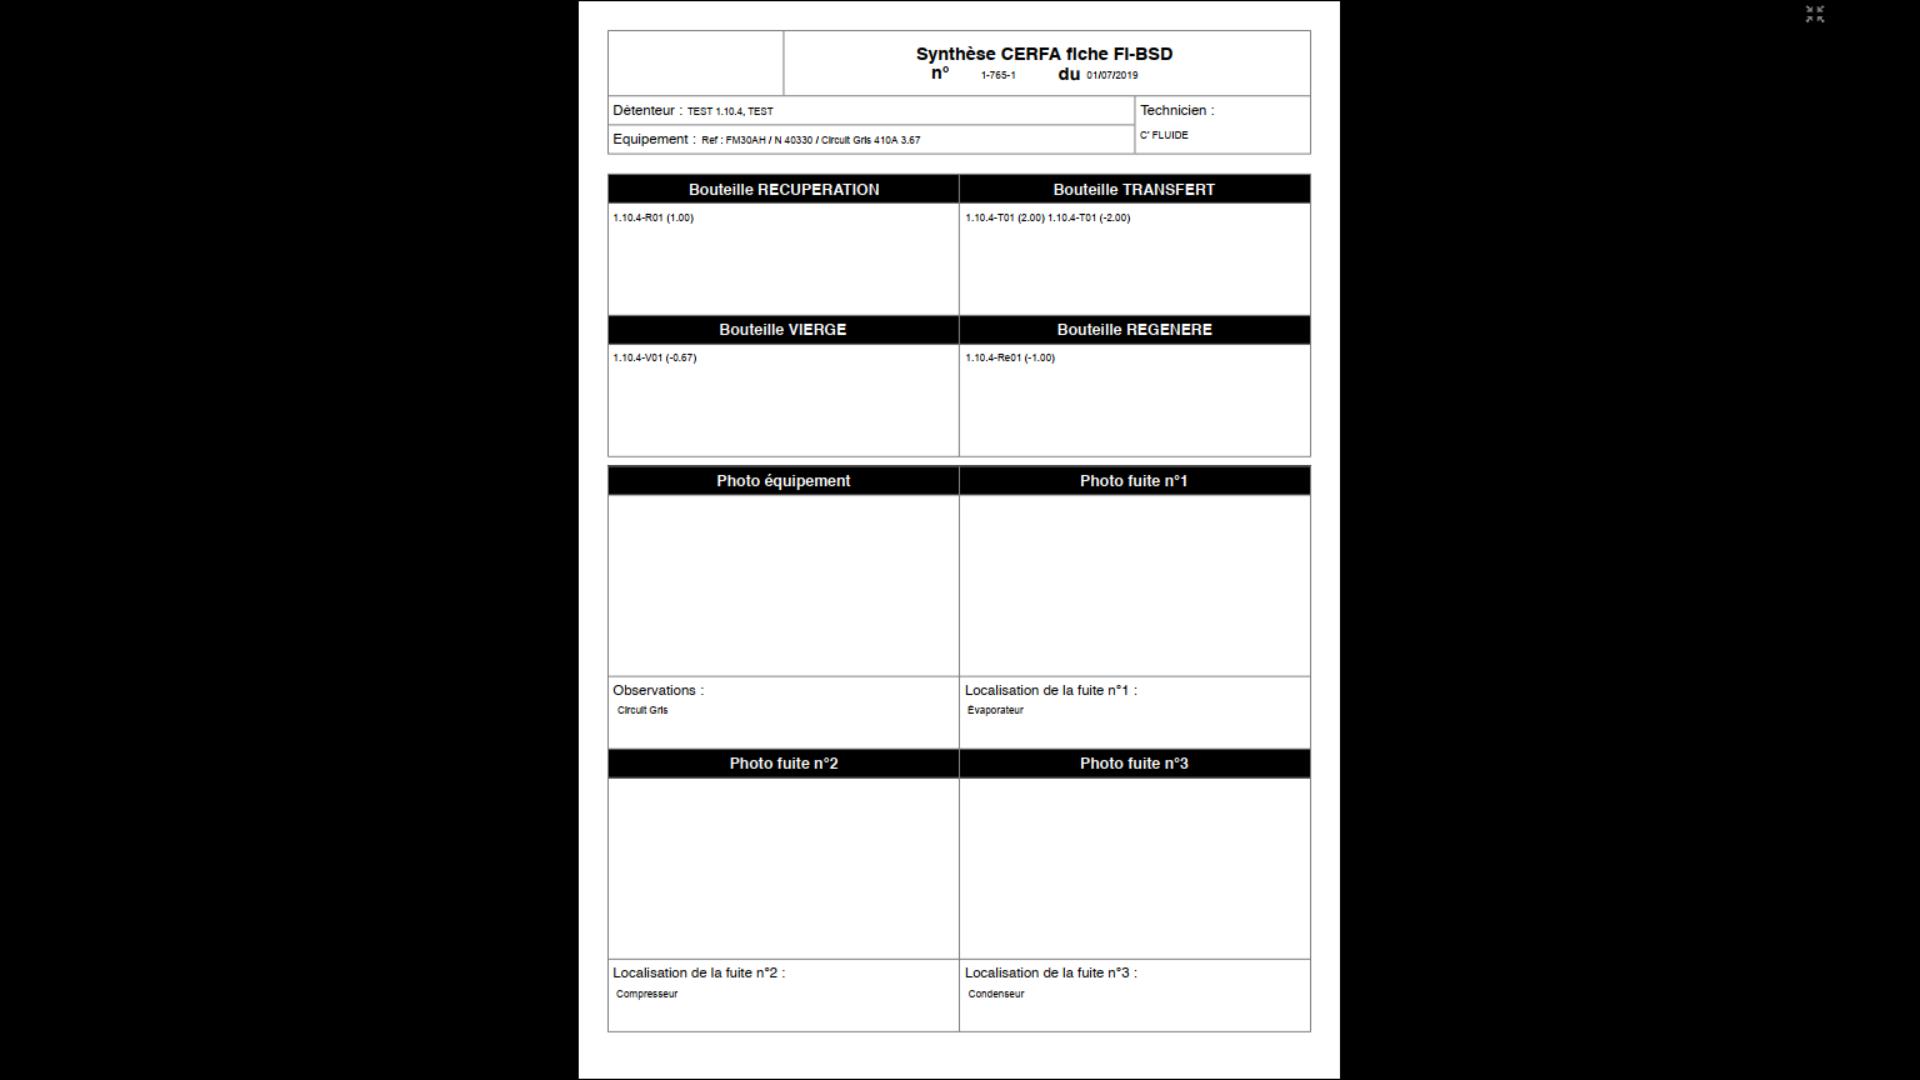 CFluide_1106_CERFA-Annexe